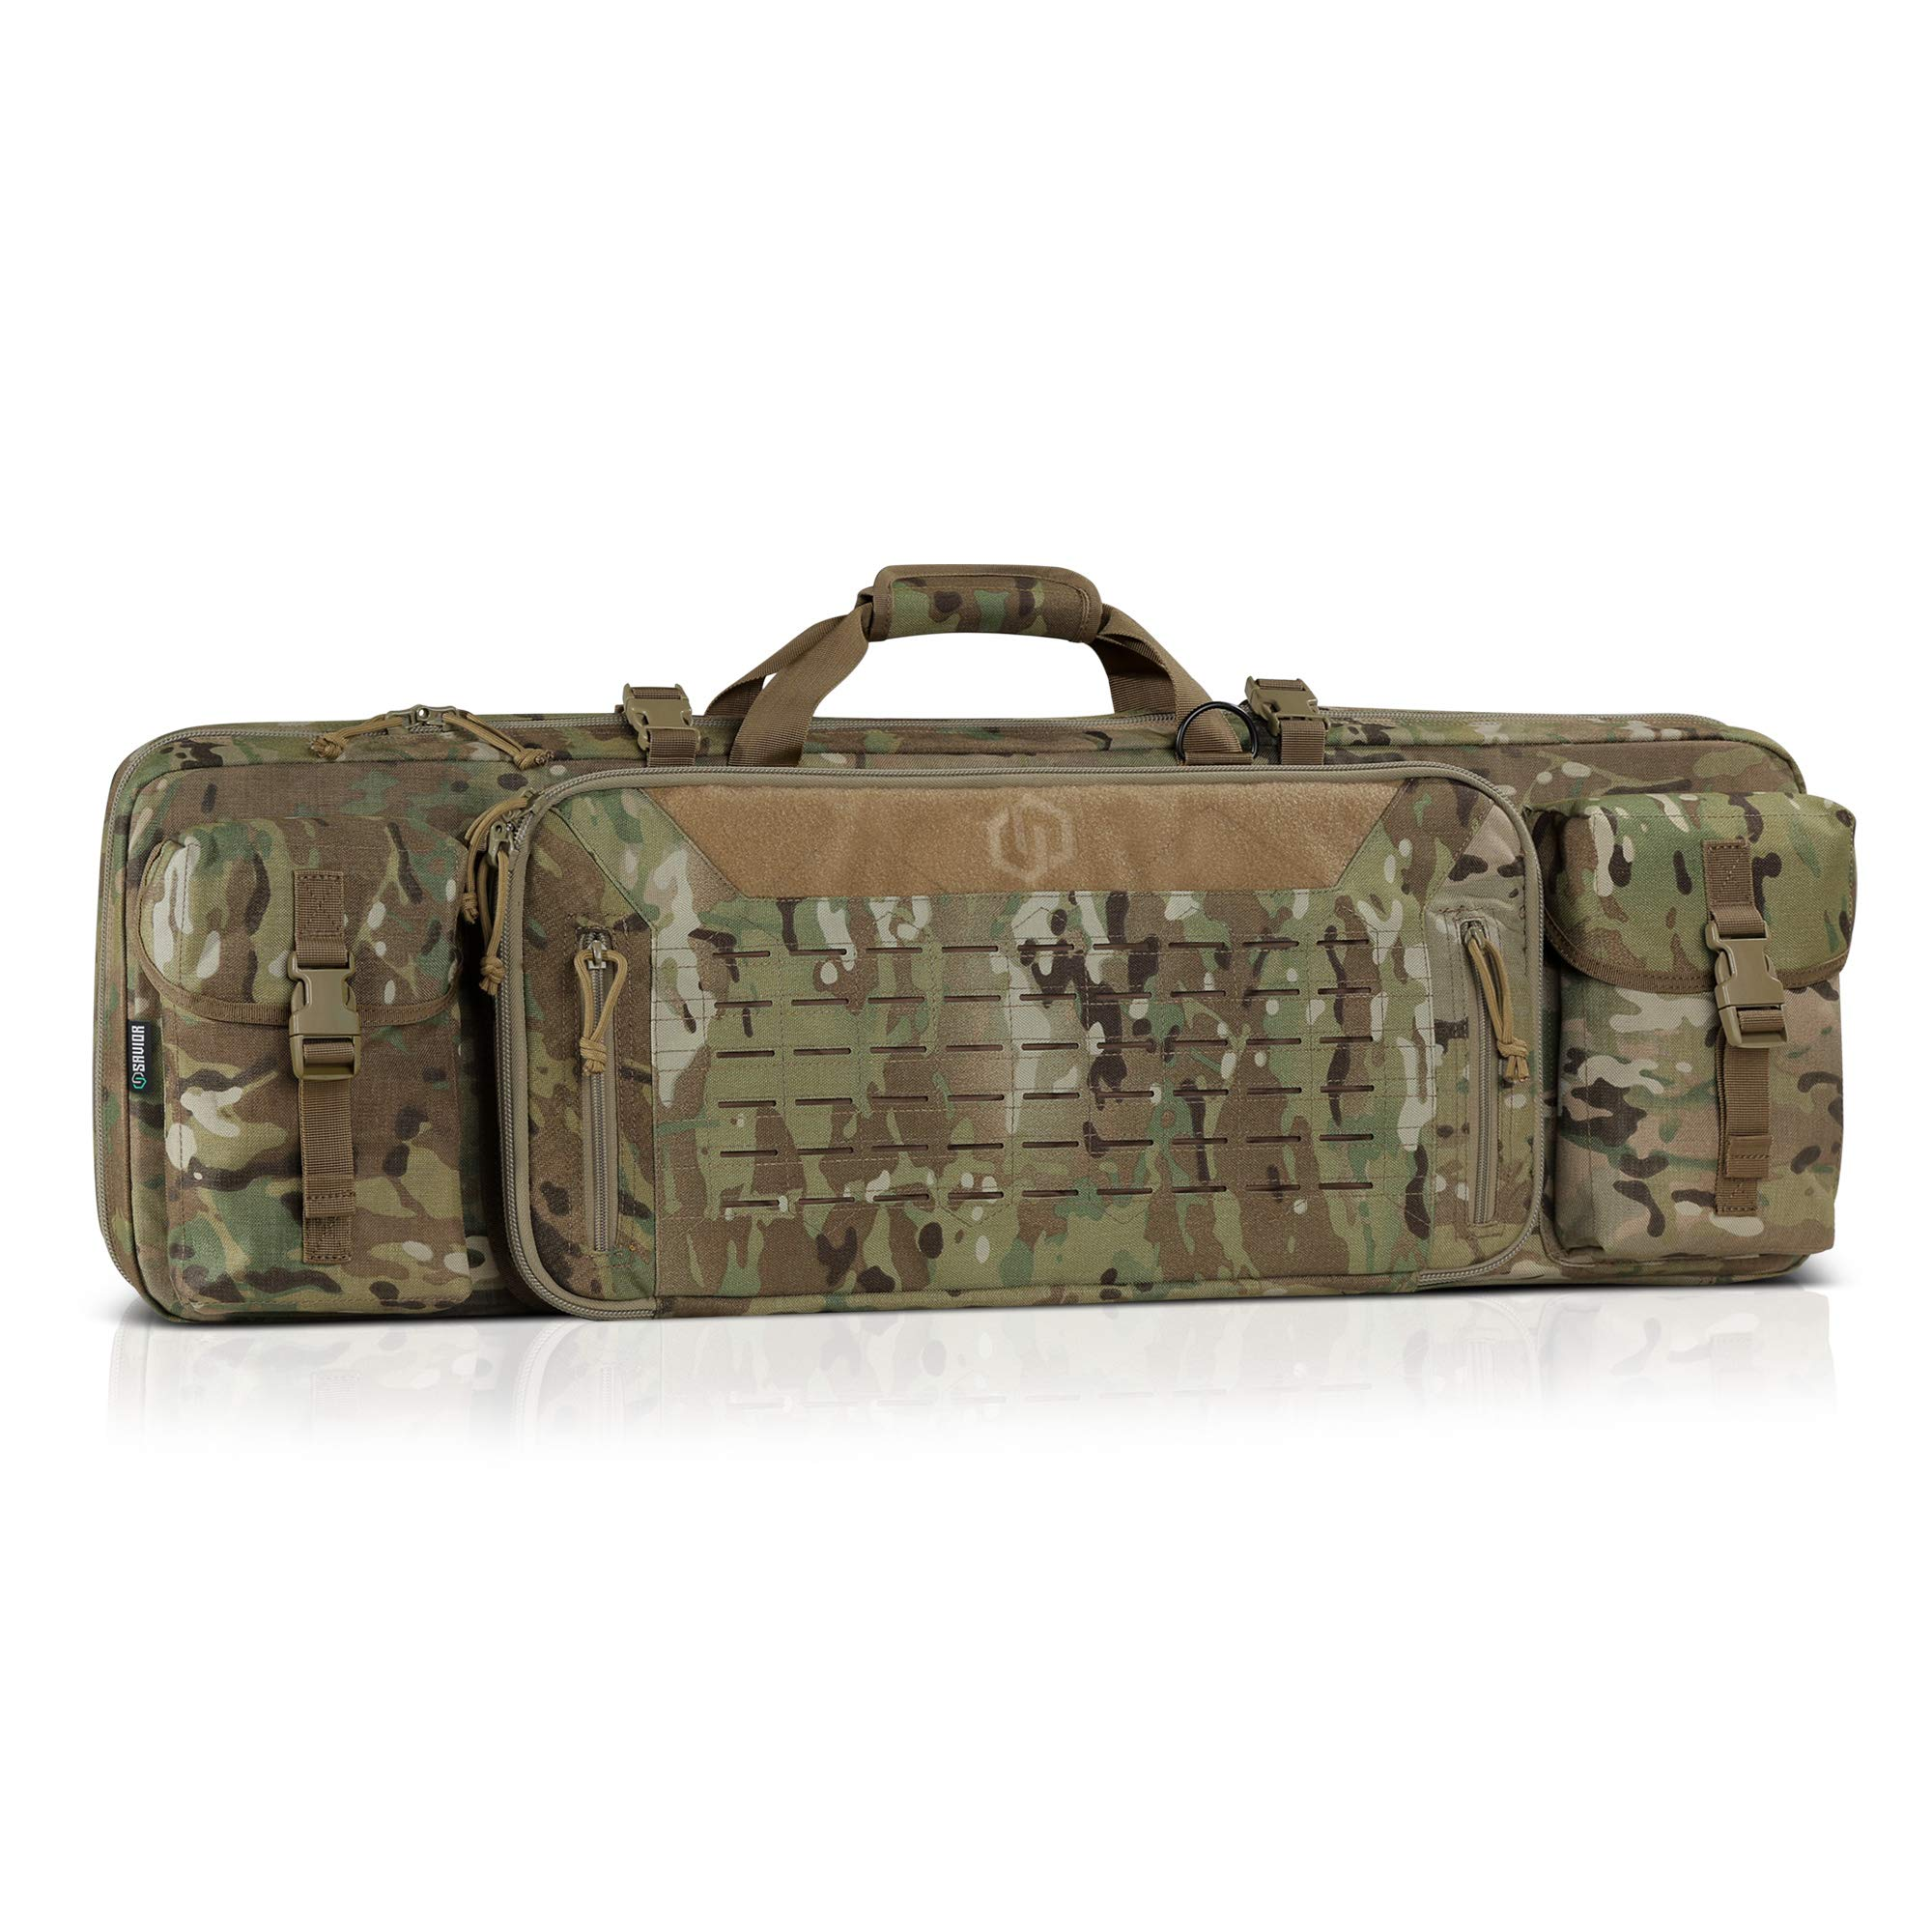 Savior Equipment 42'' Urban Warfare Multicam Original Tactical Double Carbine Long Rifle Bag Firearm Gun Case w/Removable Backpack Strap - 1000D Cordura Nylon Fabric, UTX Buckles, YKK Zippers by Savior Equipment